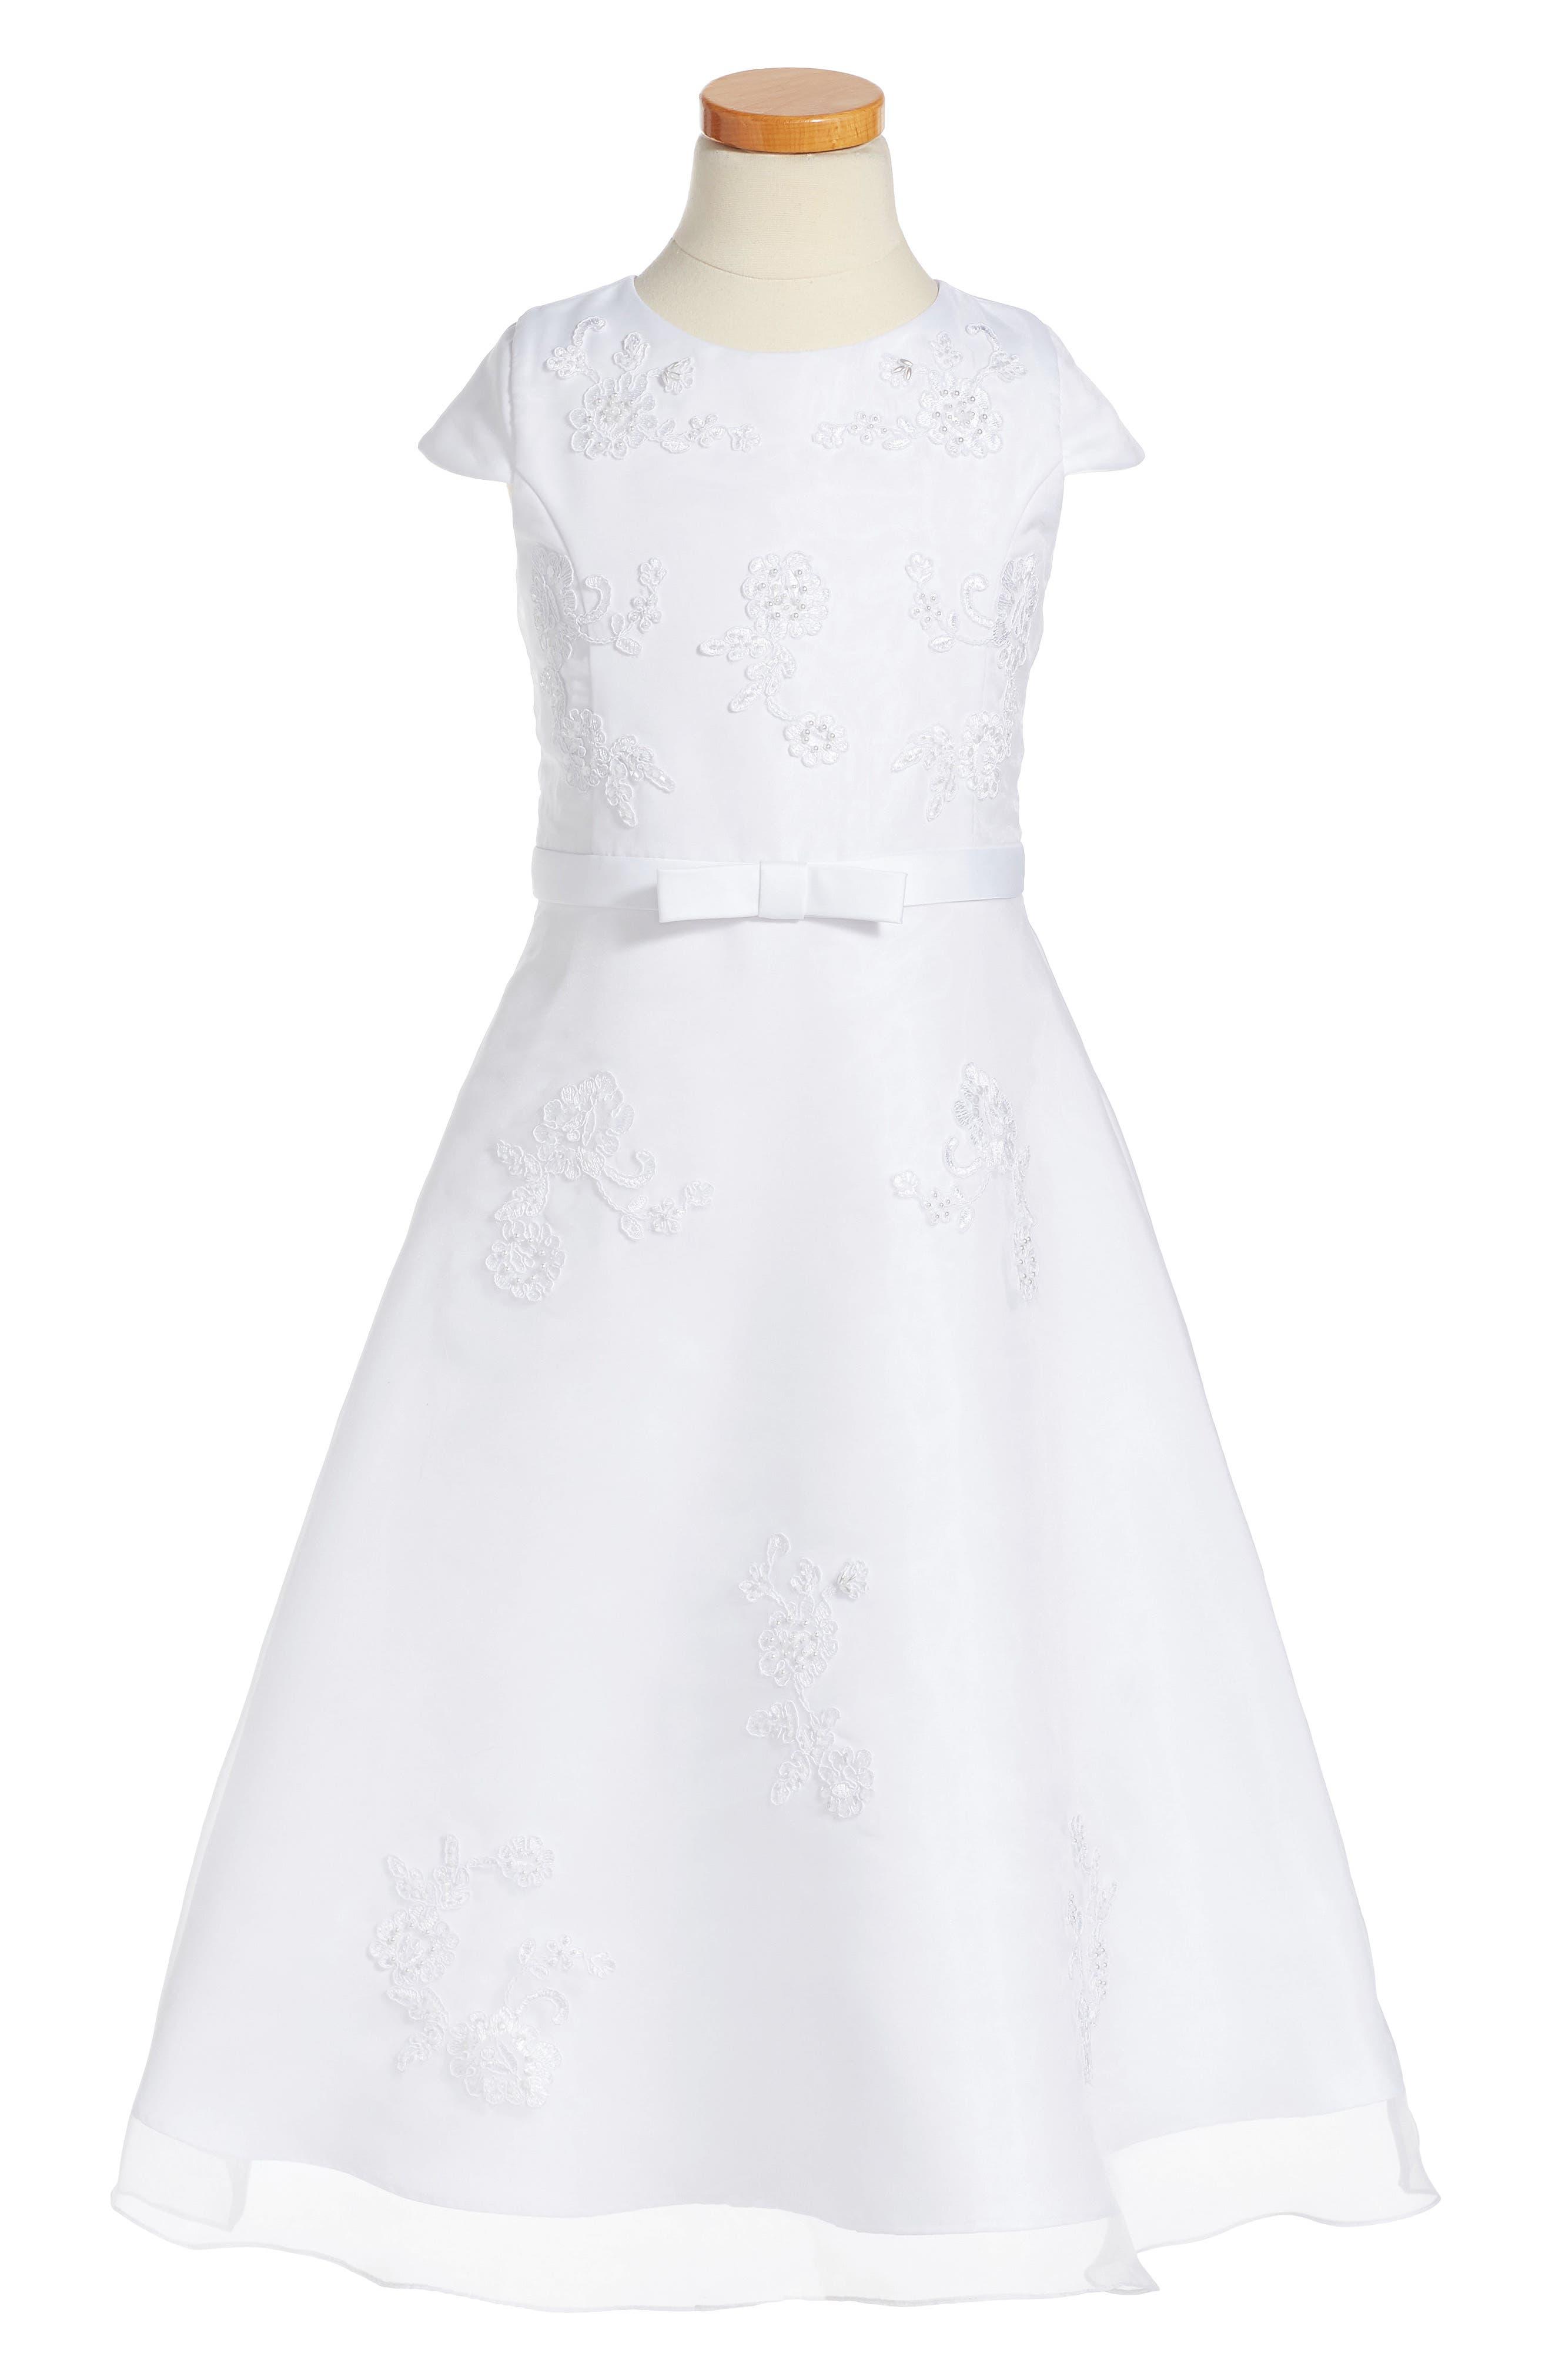 Us Angels Lace Floral Fit & Flare Dress (Little Girls & Big Girls)